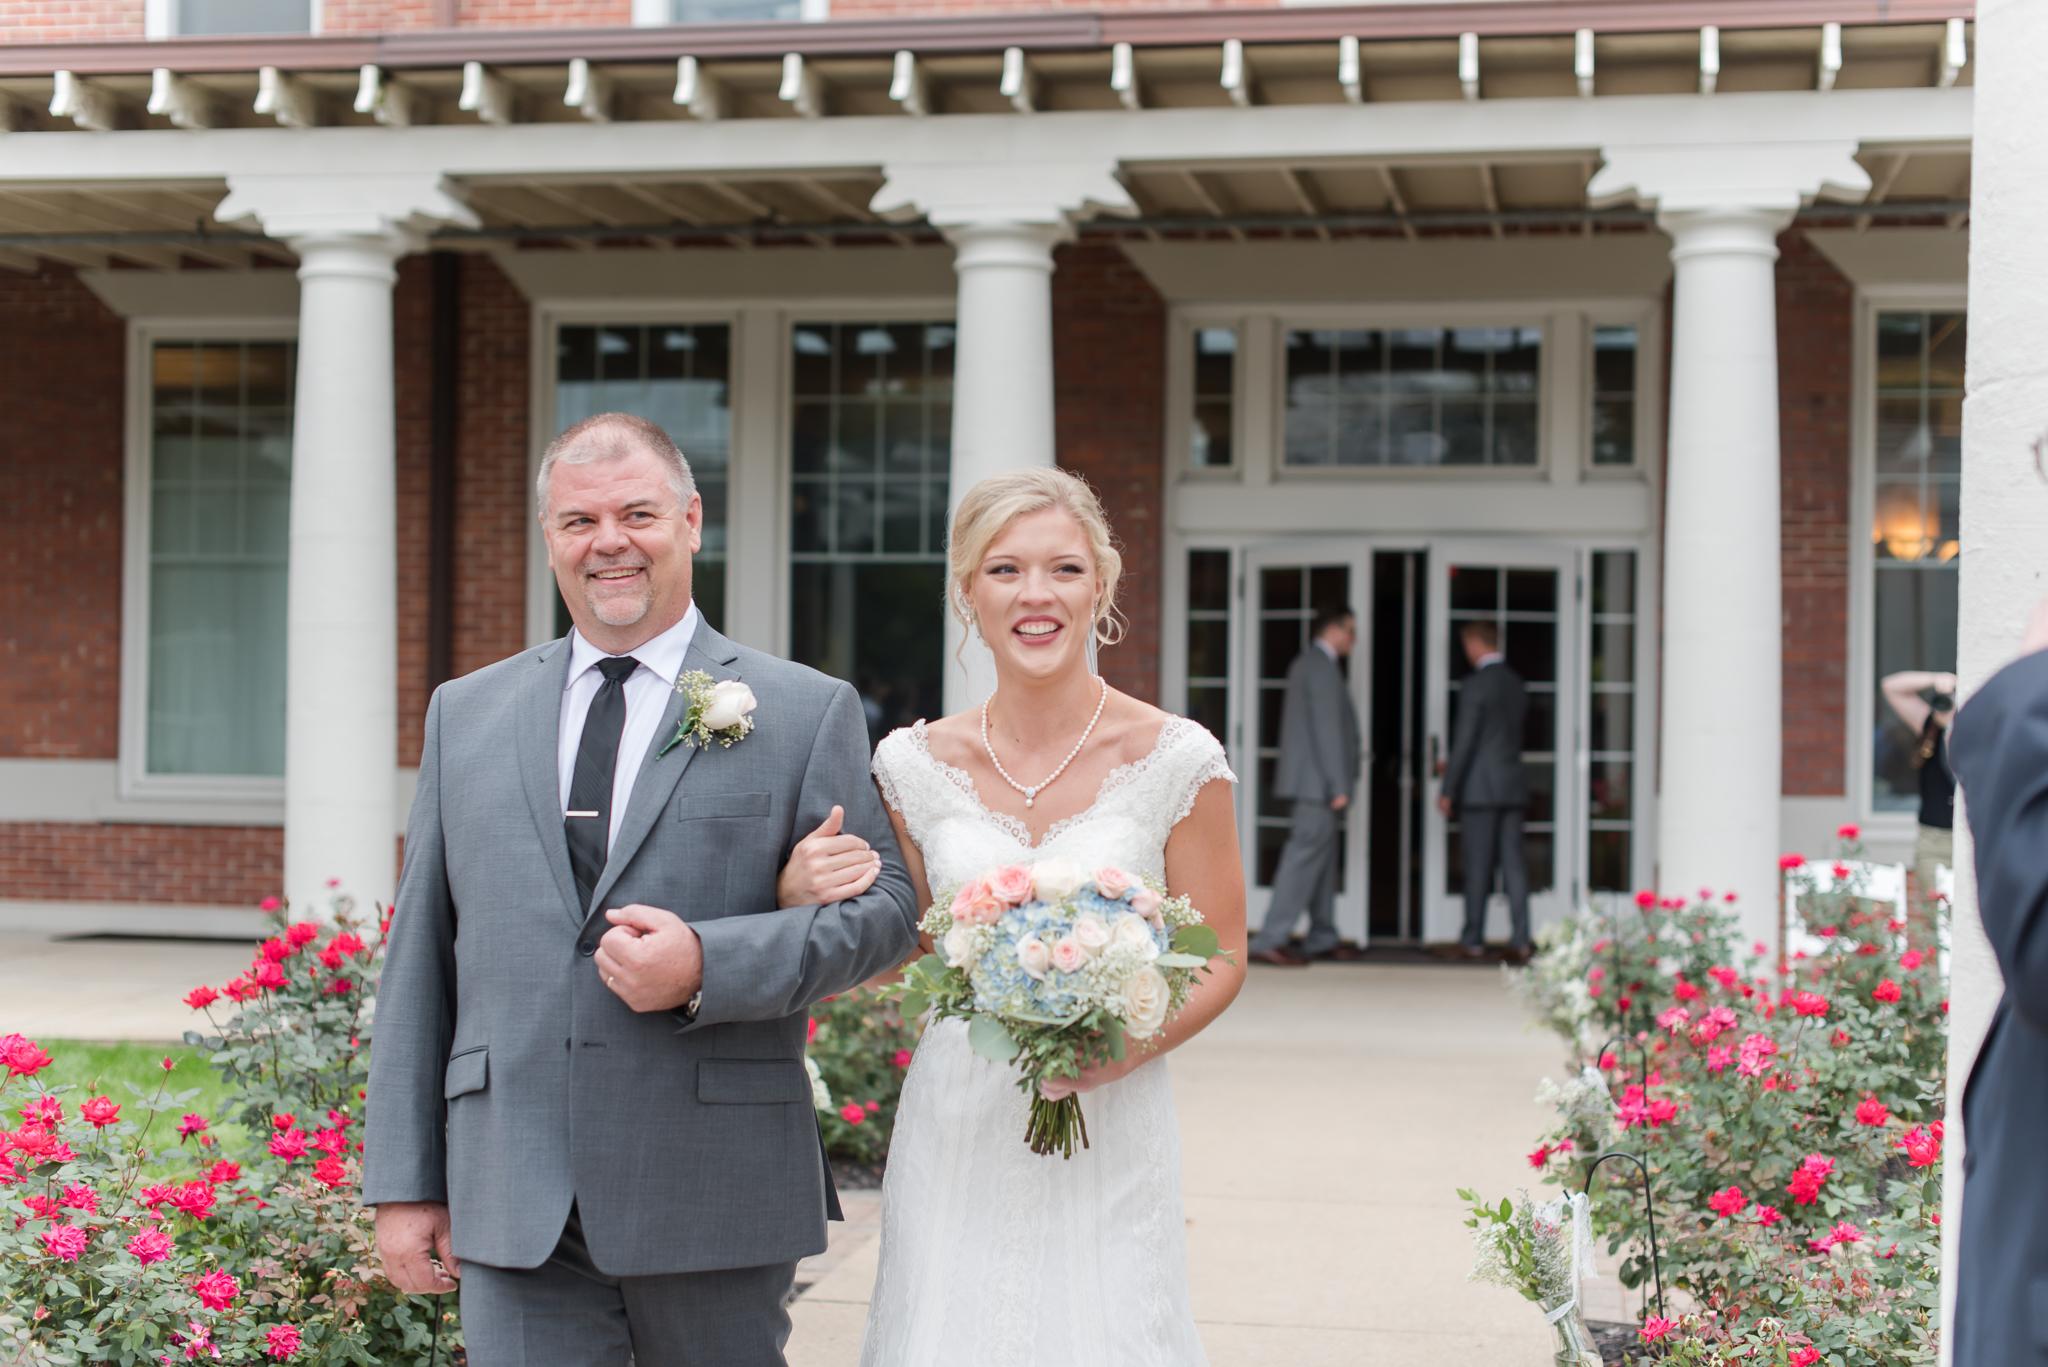 Westminister Hall Wedding Winona Lake Indiana9543.jpg